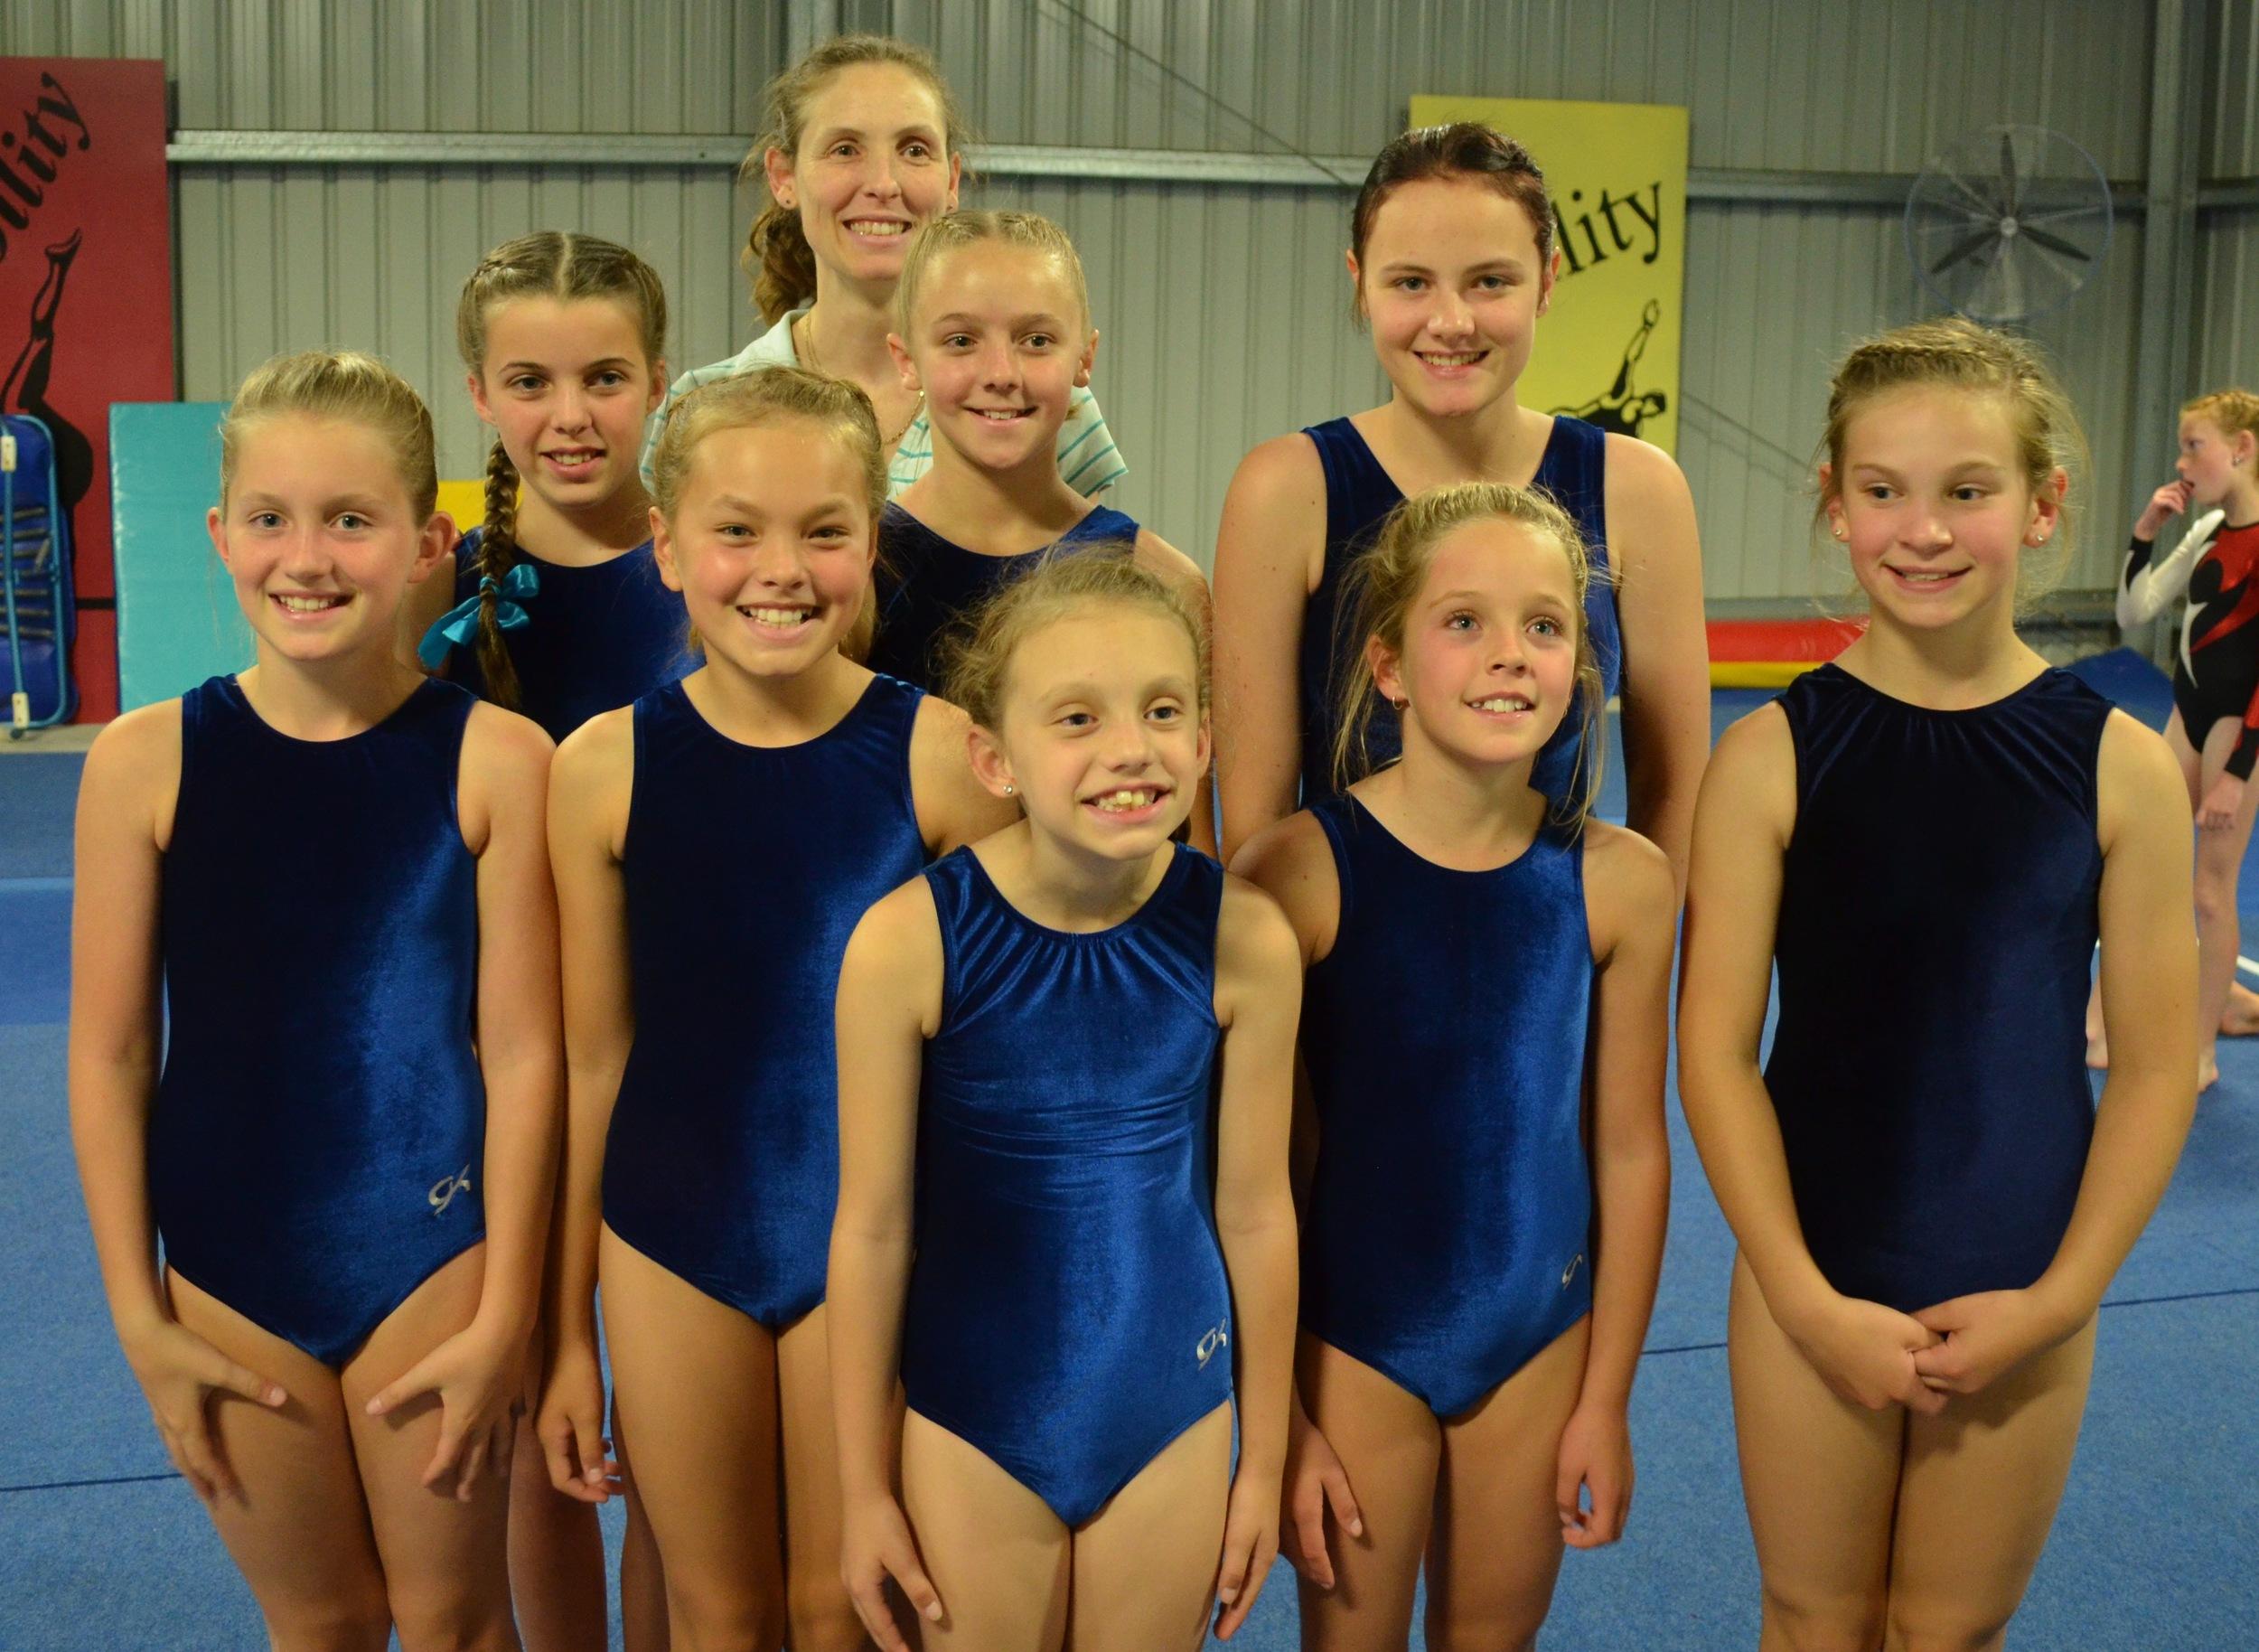 Our Senior Level 1 Team: Back - Emily, Amber, Jade Front - Maggie, Keira, Dominique, Jessica, Megan